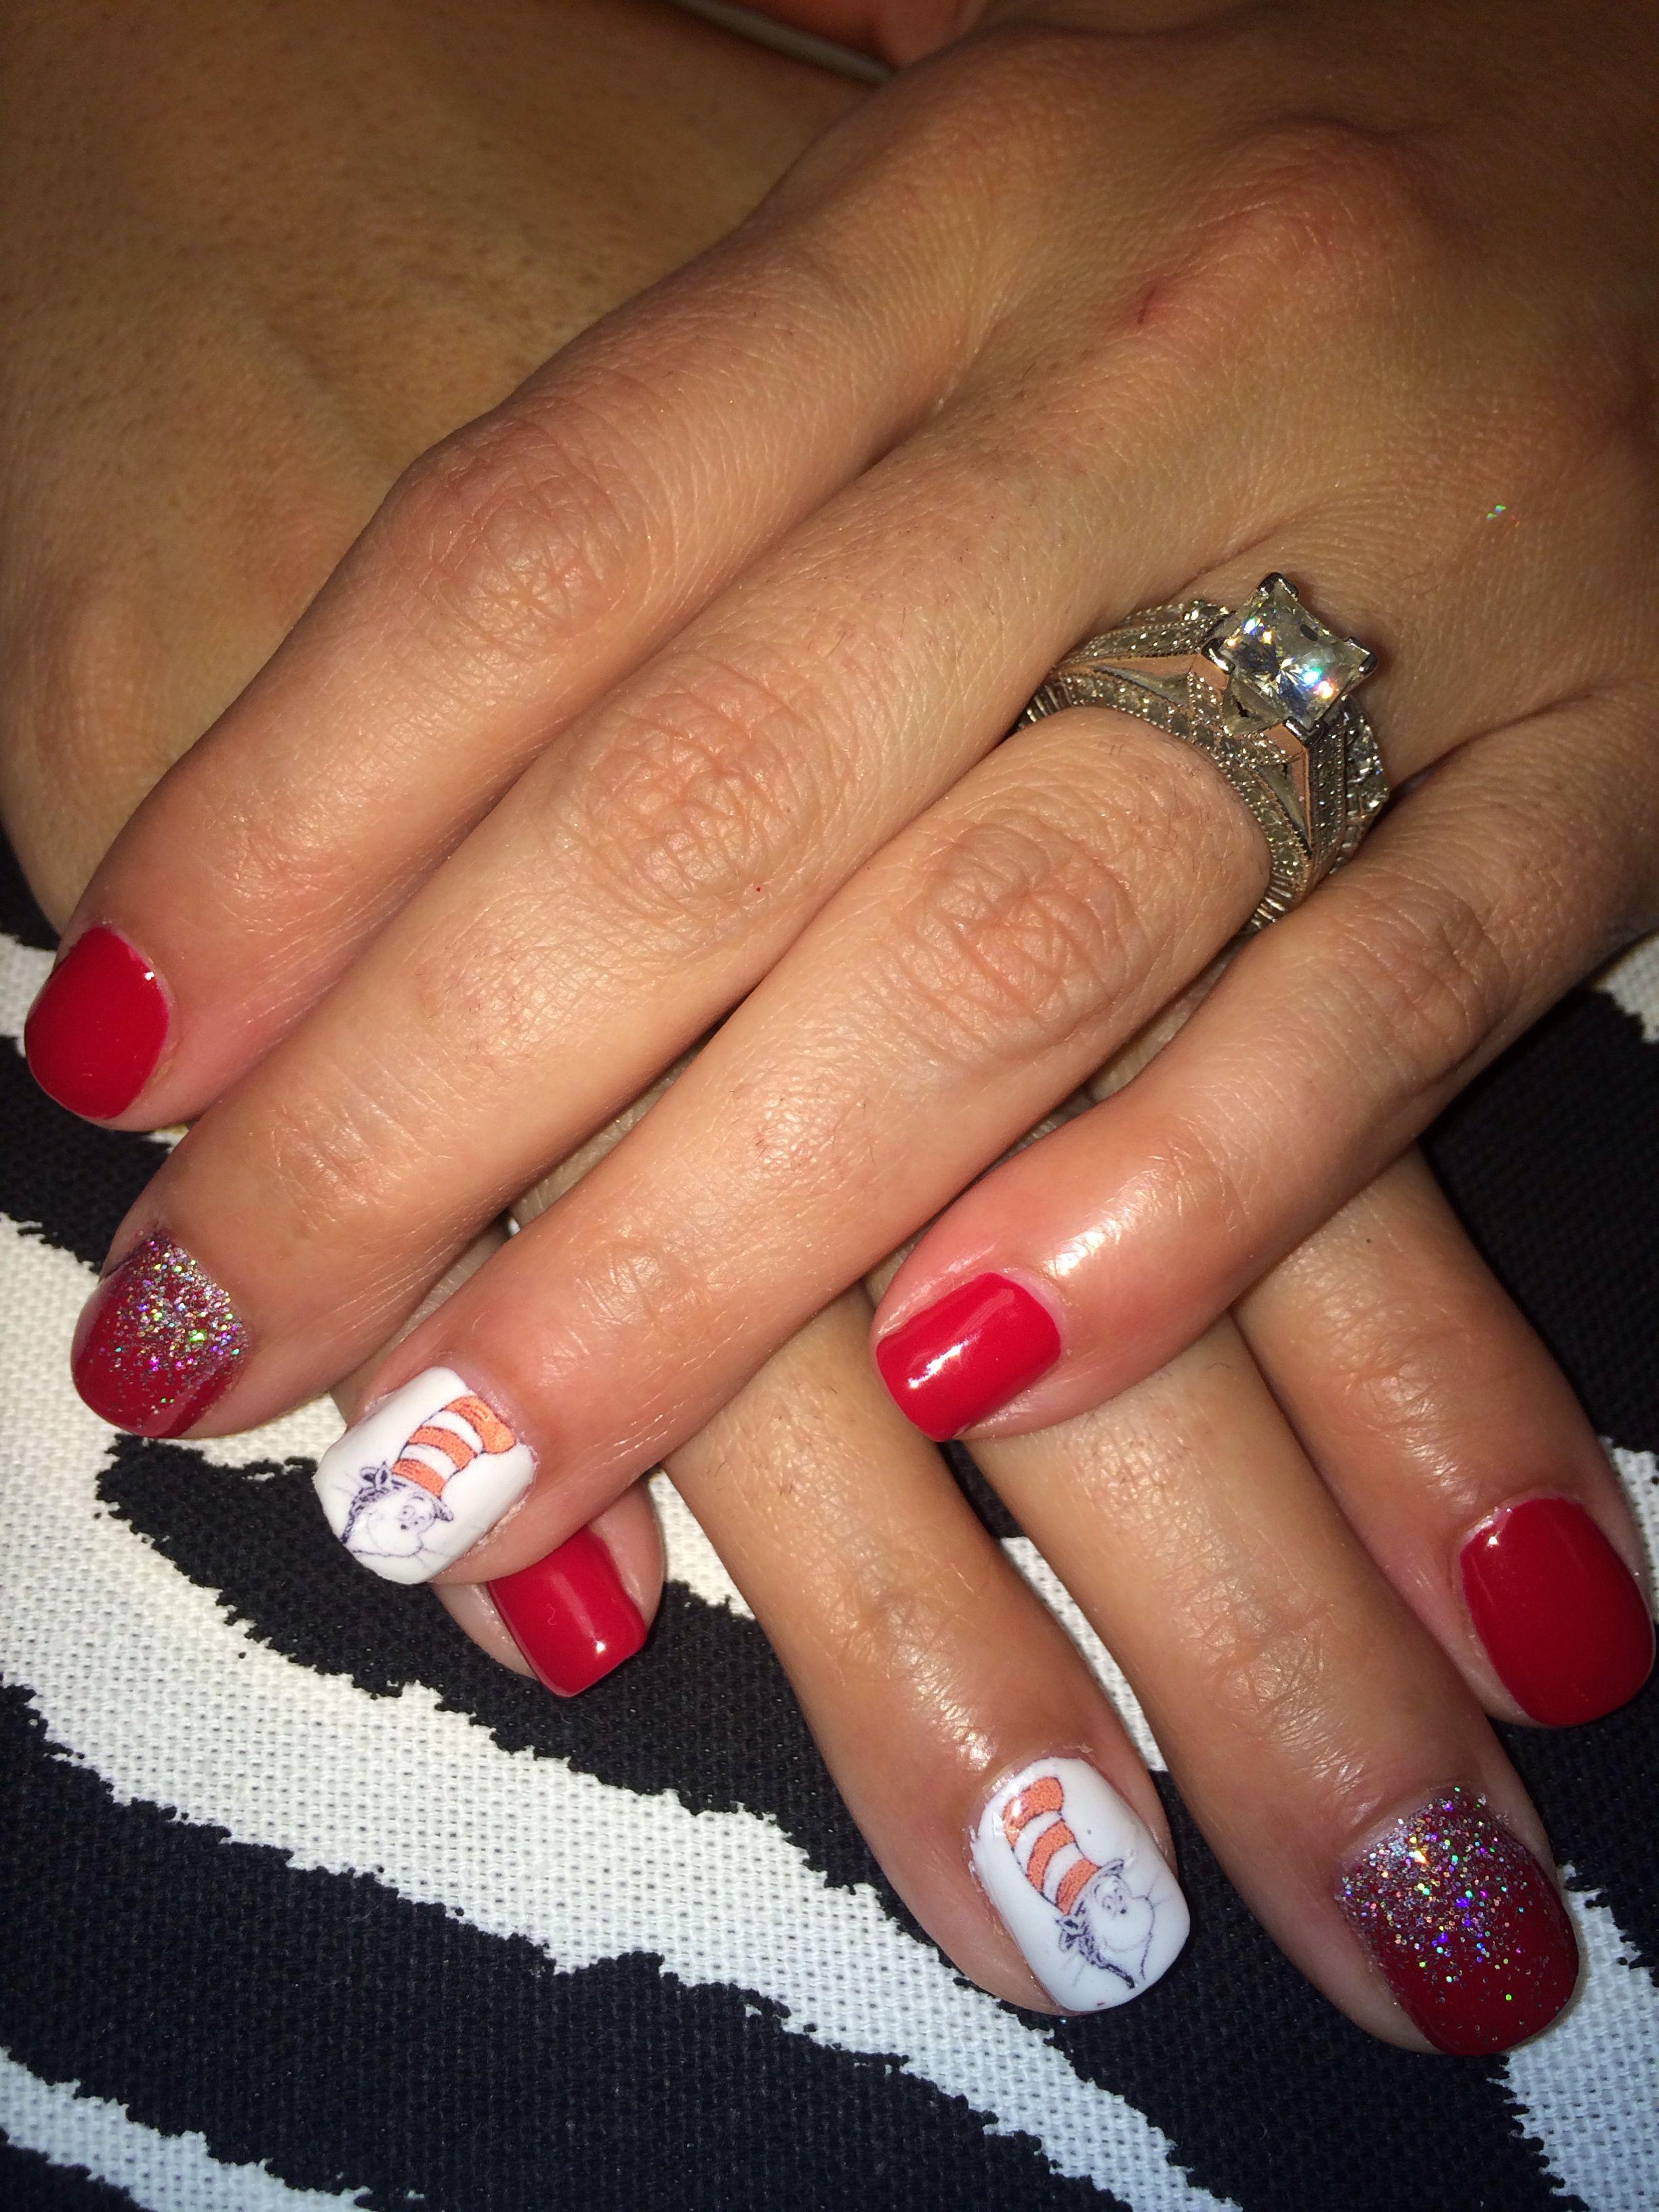 Nails By Jenny Lynn | Nails By Jenny Lynn Blue Ridge, Ga | Pinterest